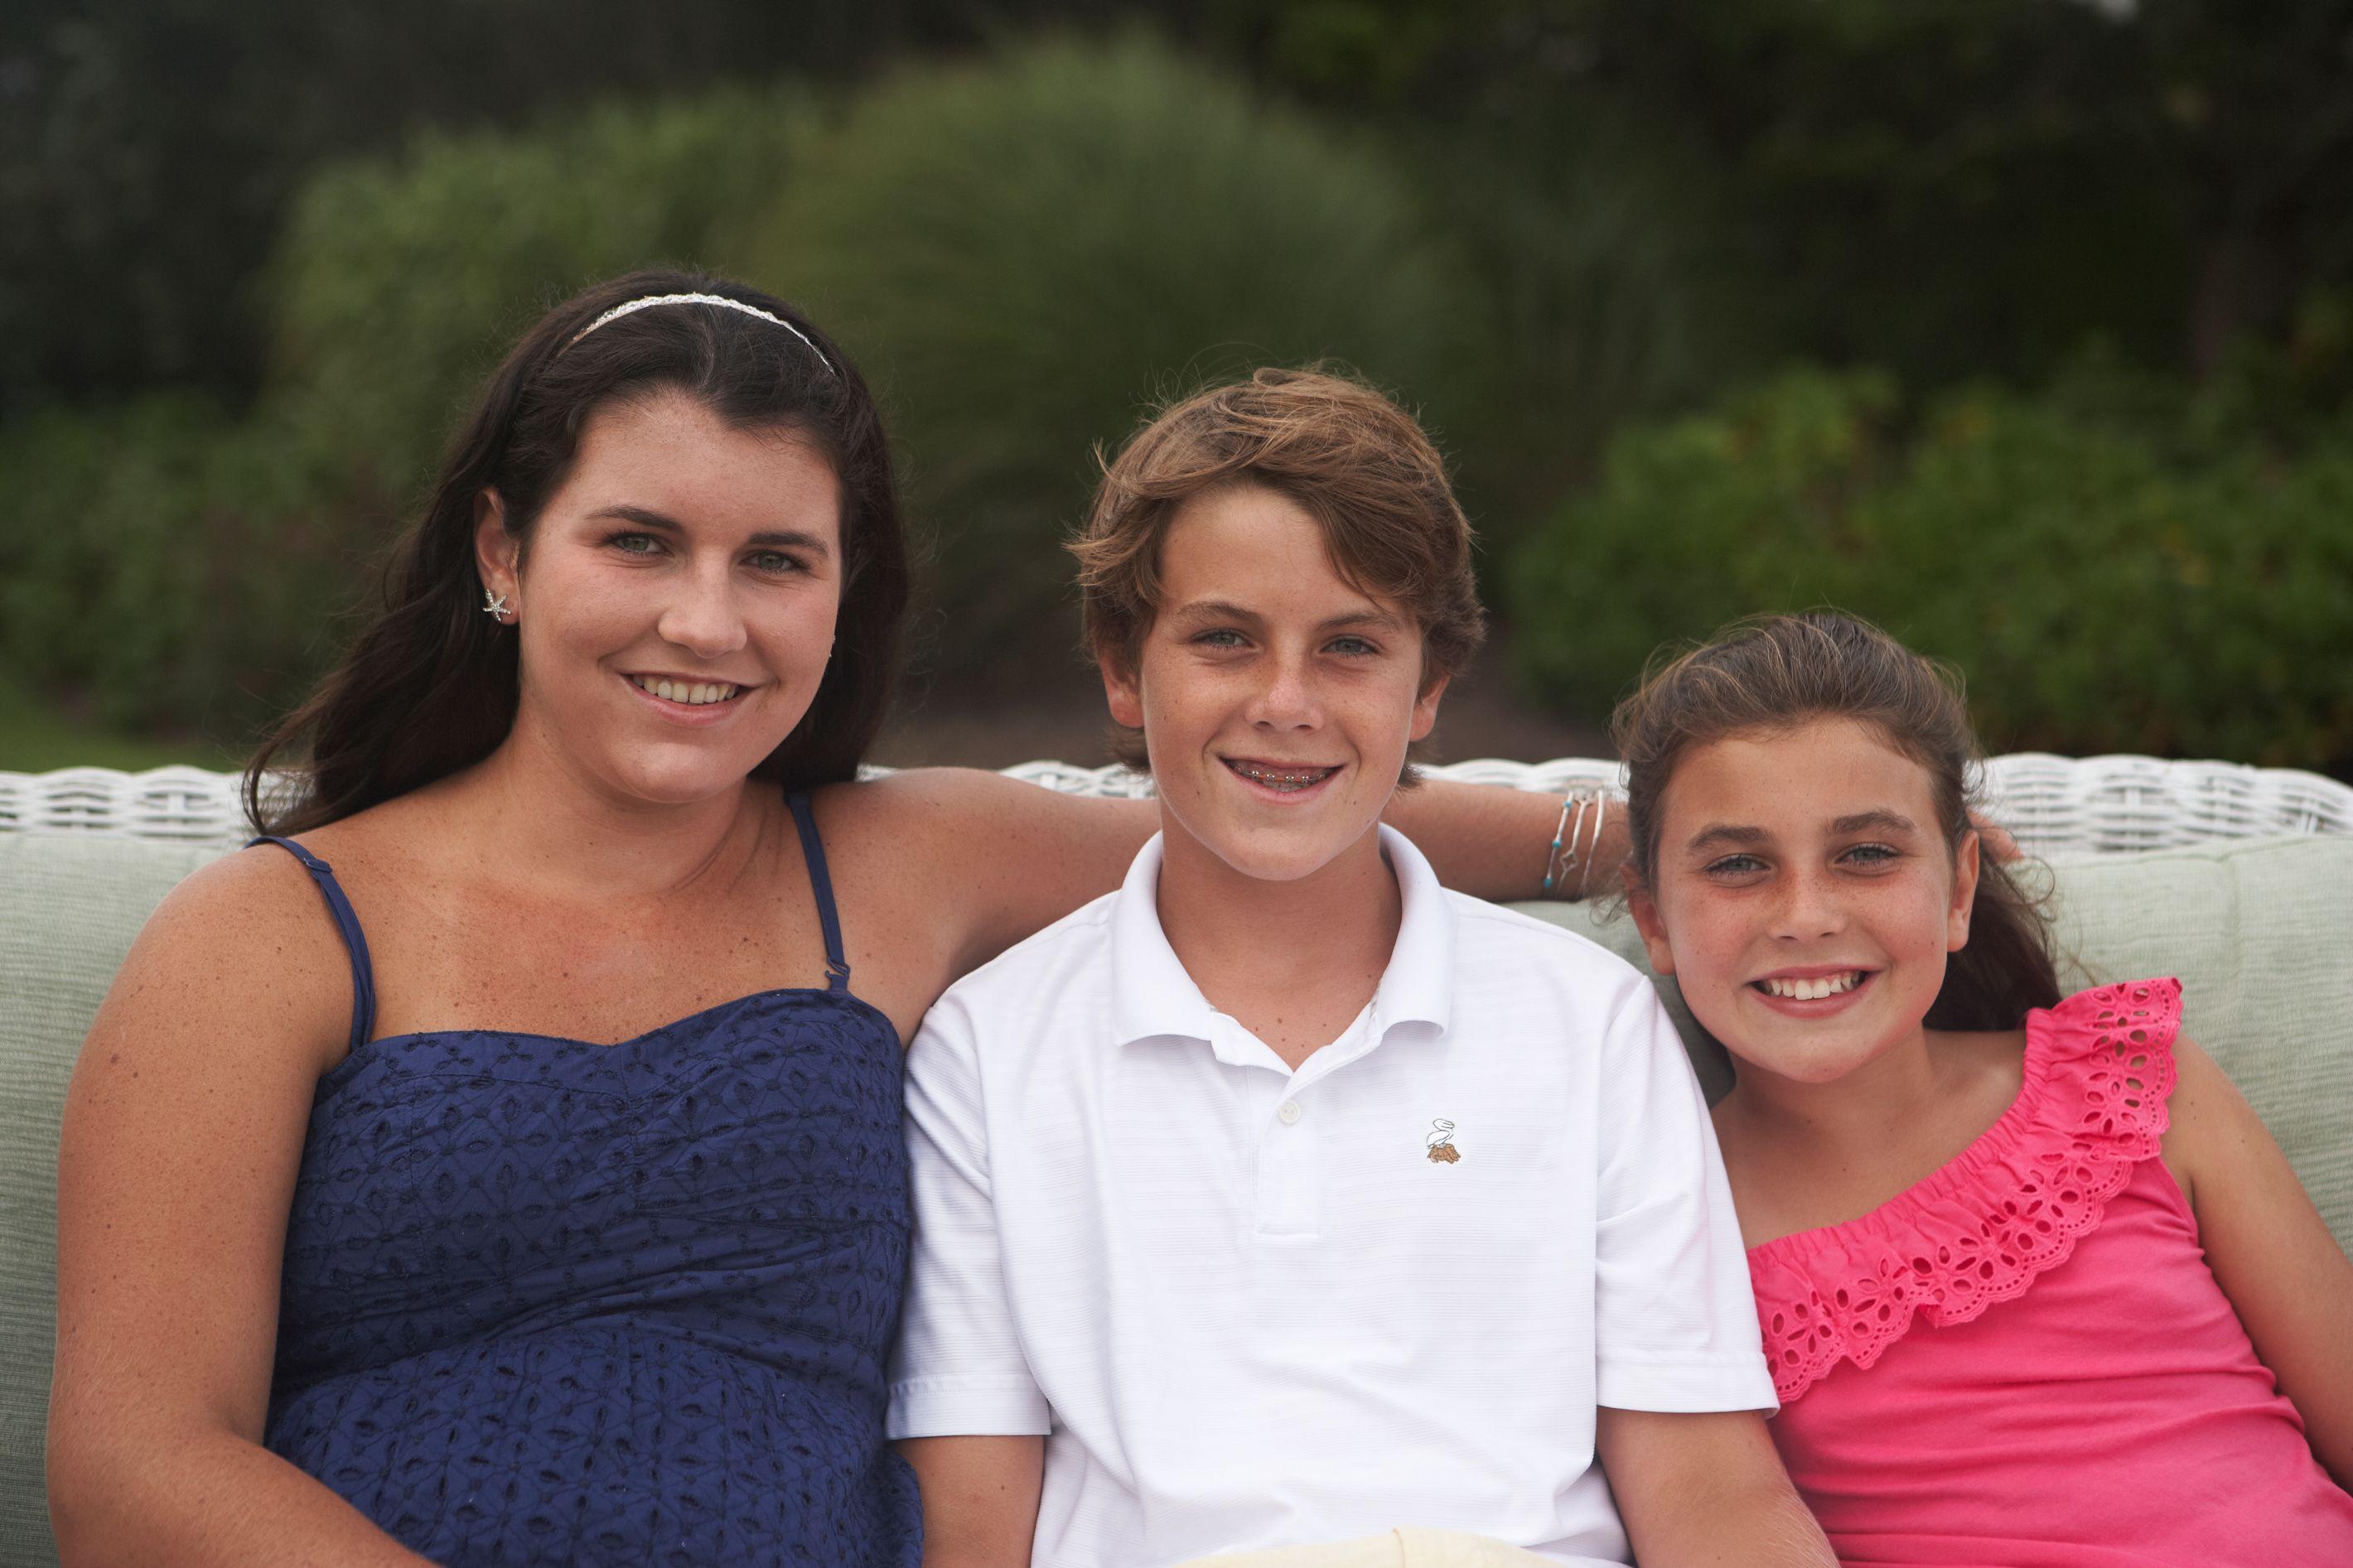 201208_Oneill_Family_Portraits_298.jpg